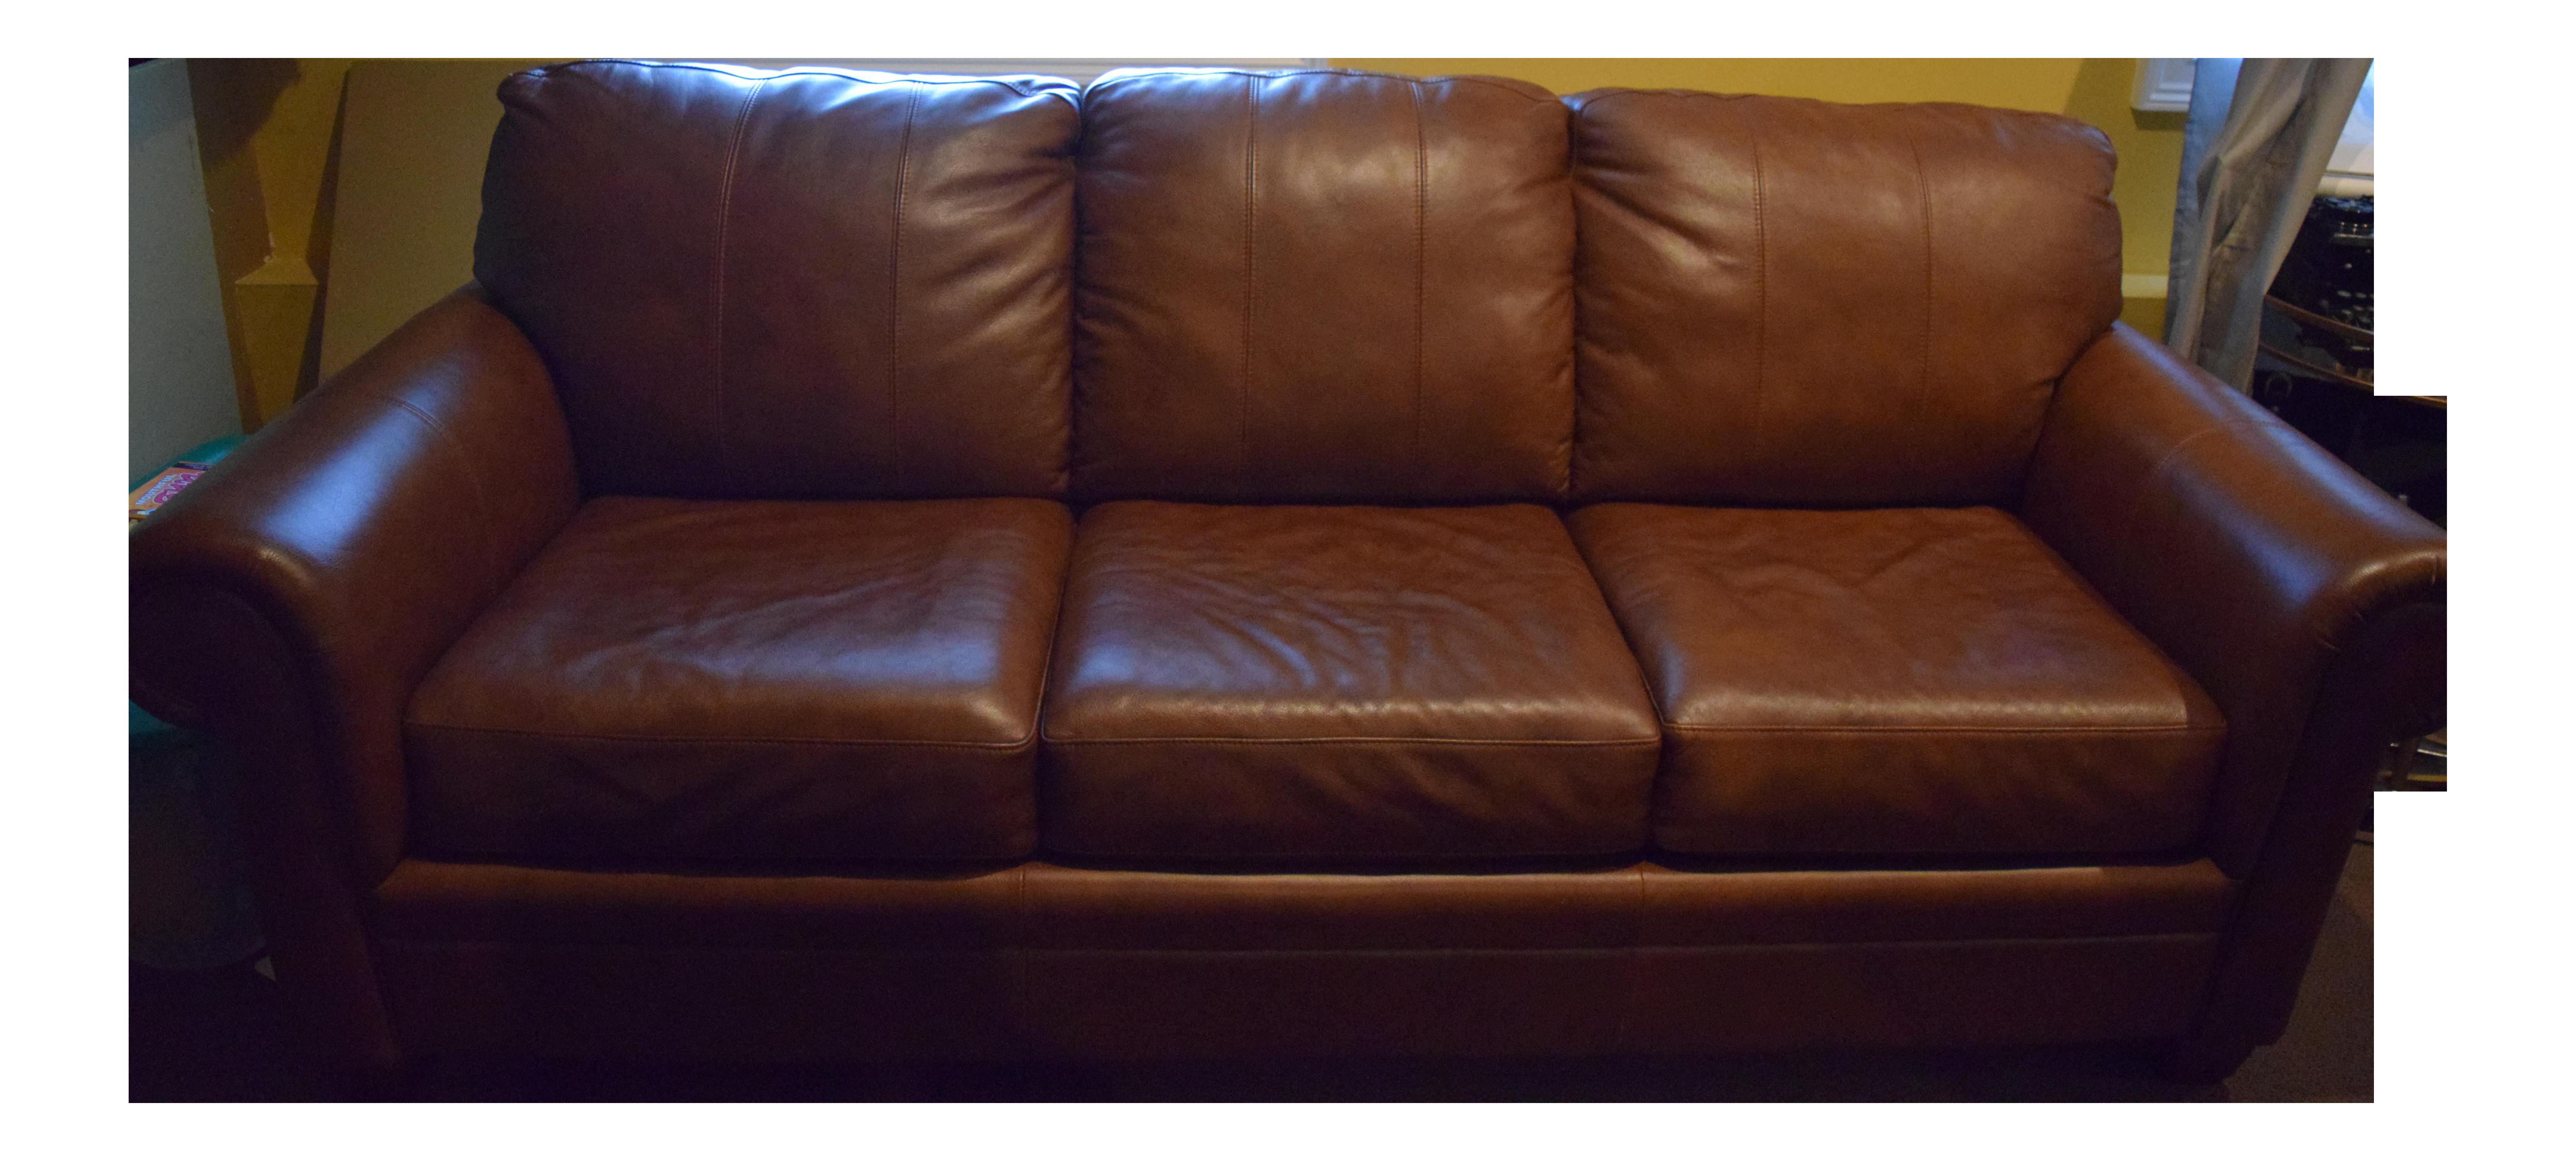 Ethan Allen Brown Leather Sleeper Sofa   Queen Coil U0026 Foam Mattress, Saddle  Brown | Chairish